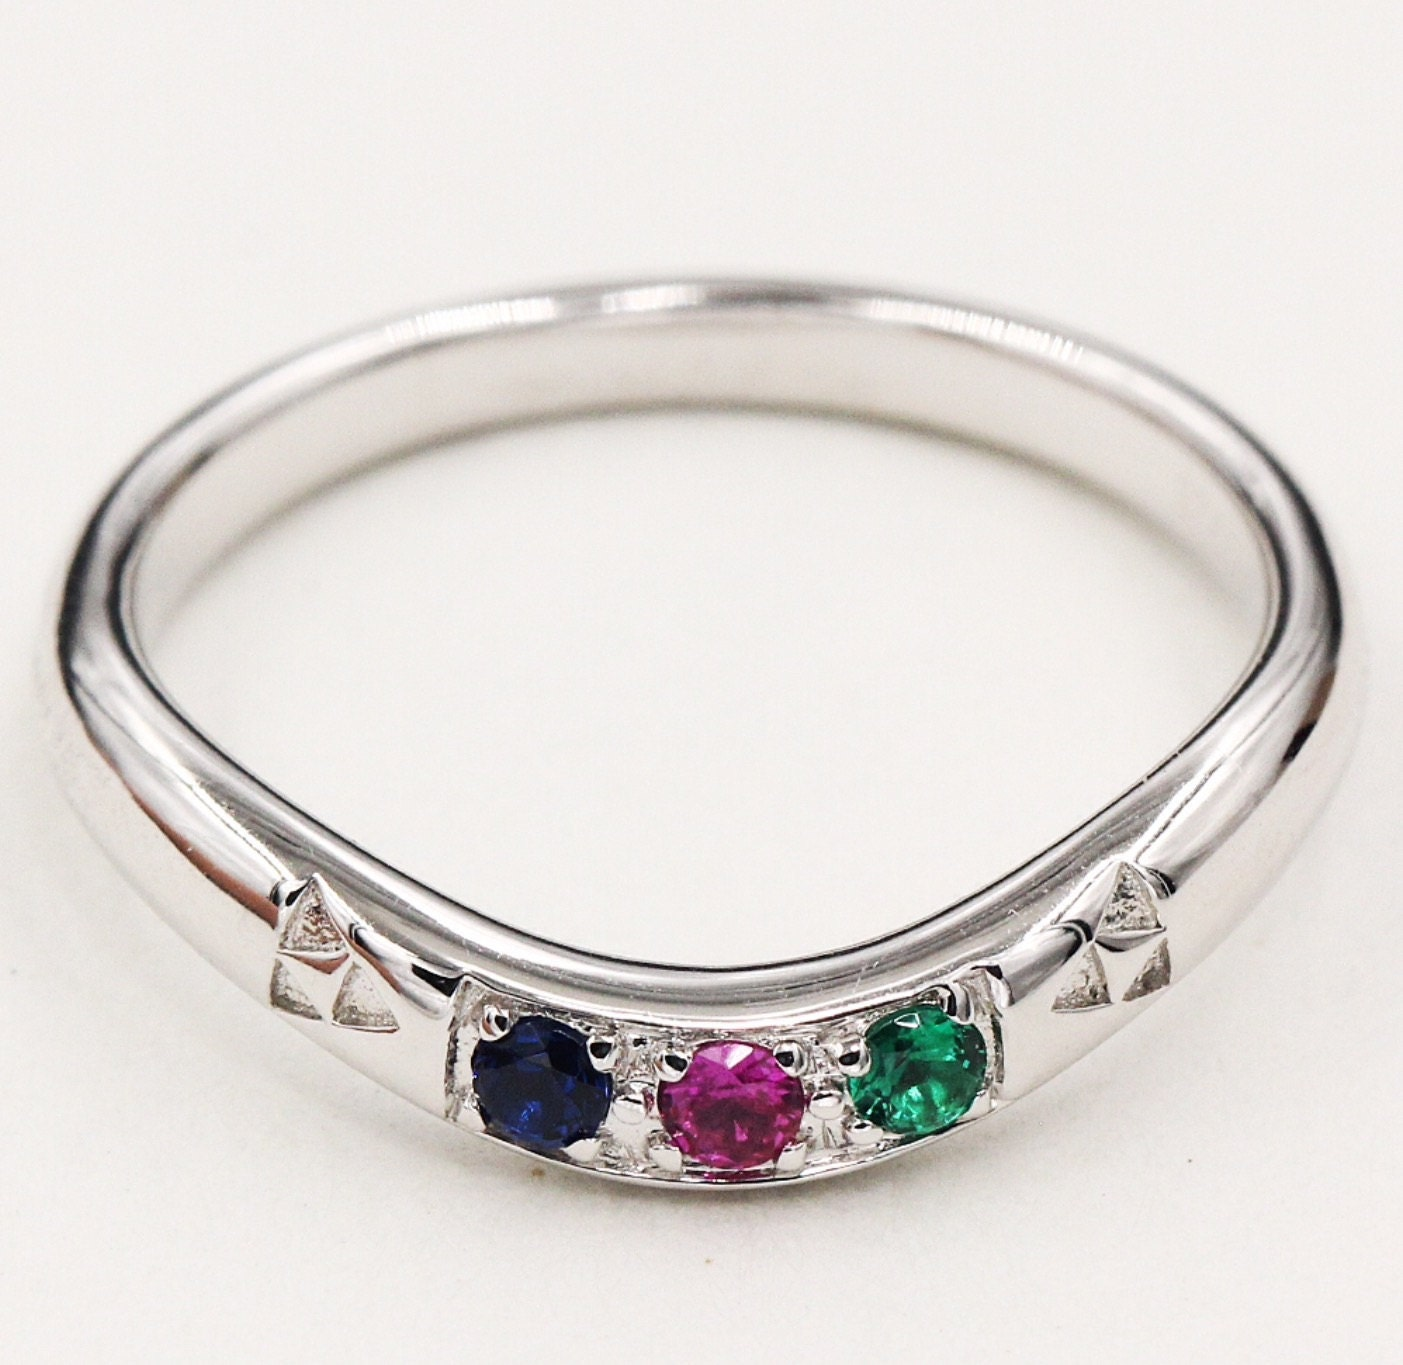 50: Spiritual Stones Zelda Wedding Rings At Websimilar.org